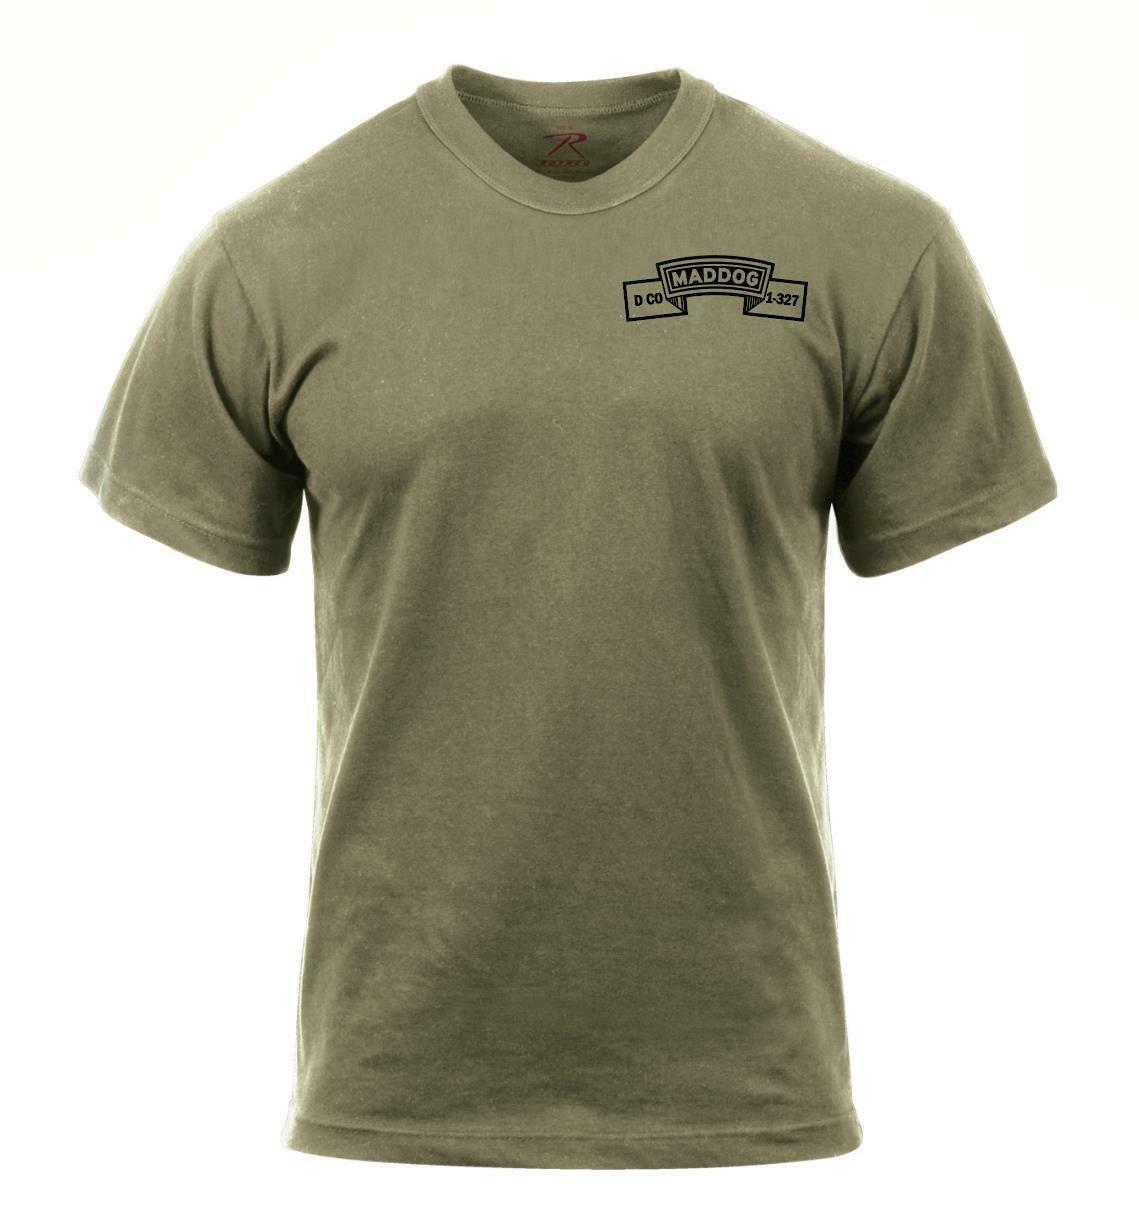 Savage Platoon Maddog Co. 1-327th IN Shirt